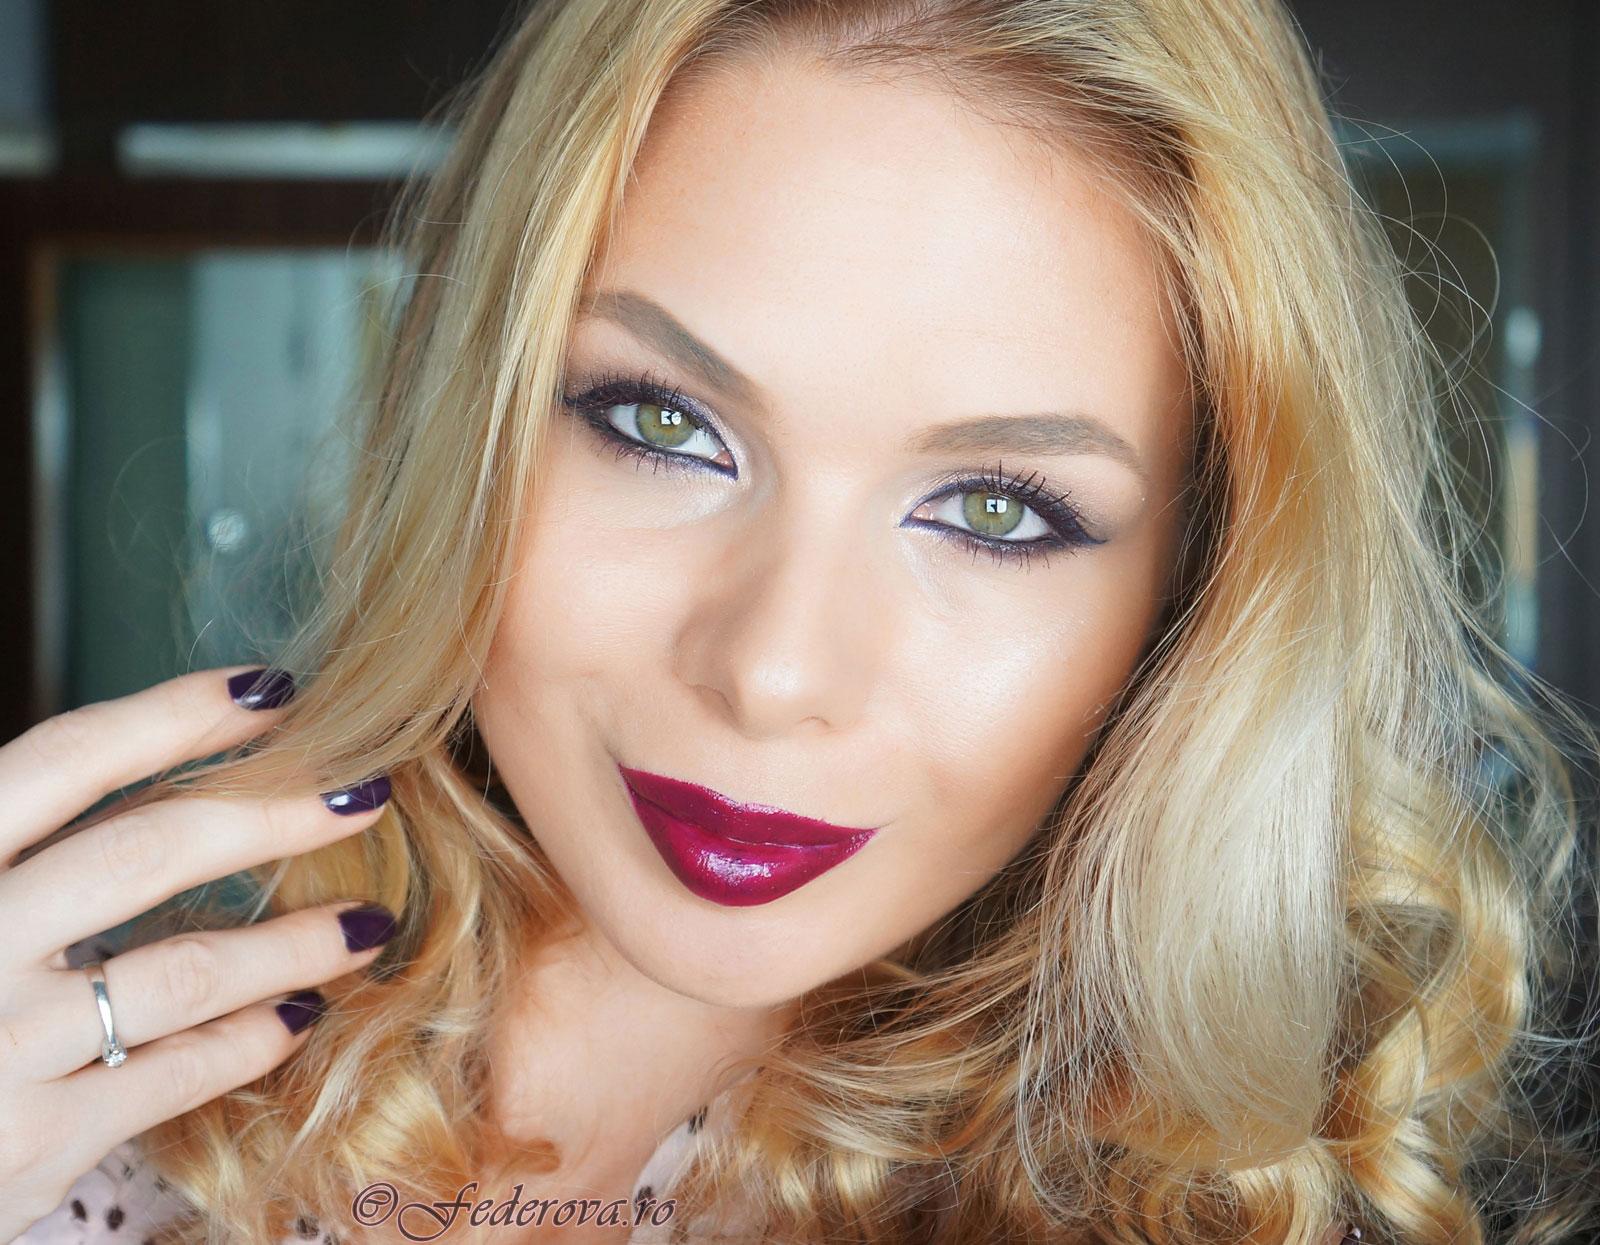 pupa-romania-federova-makeup